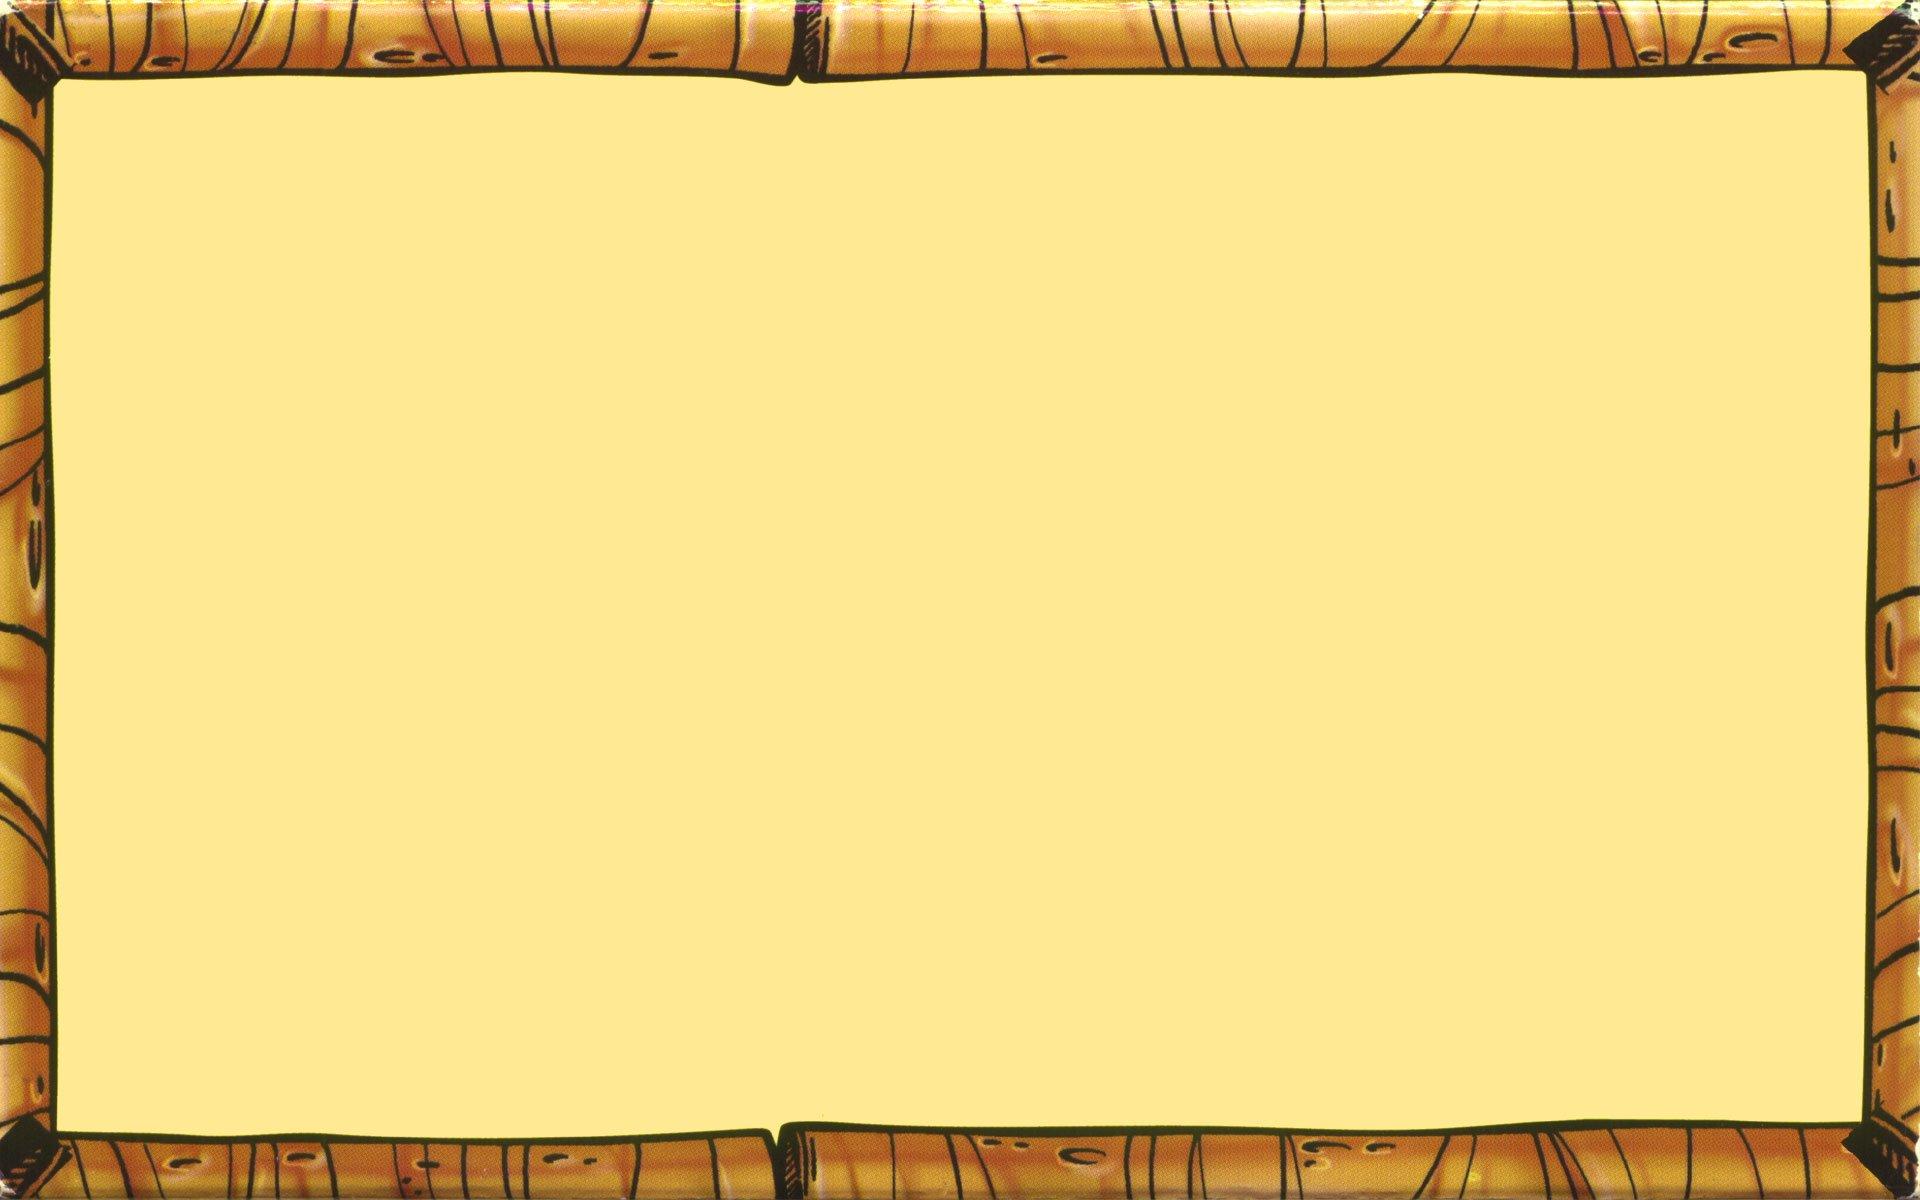 Border Wallpapers HD   PixelsTalk.Net